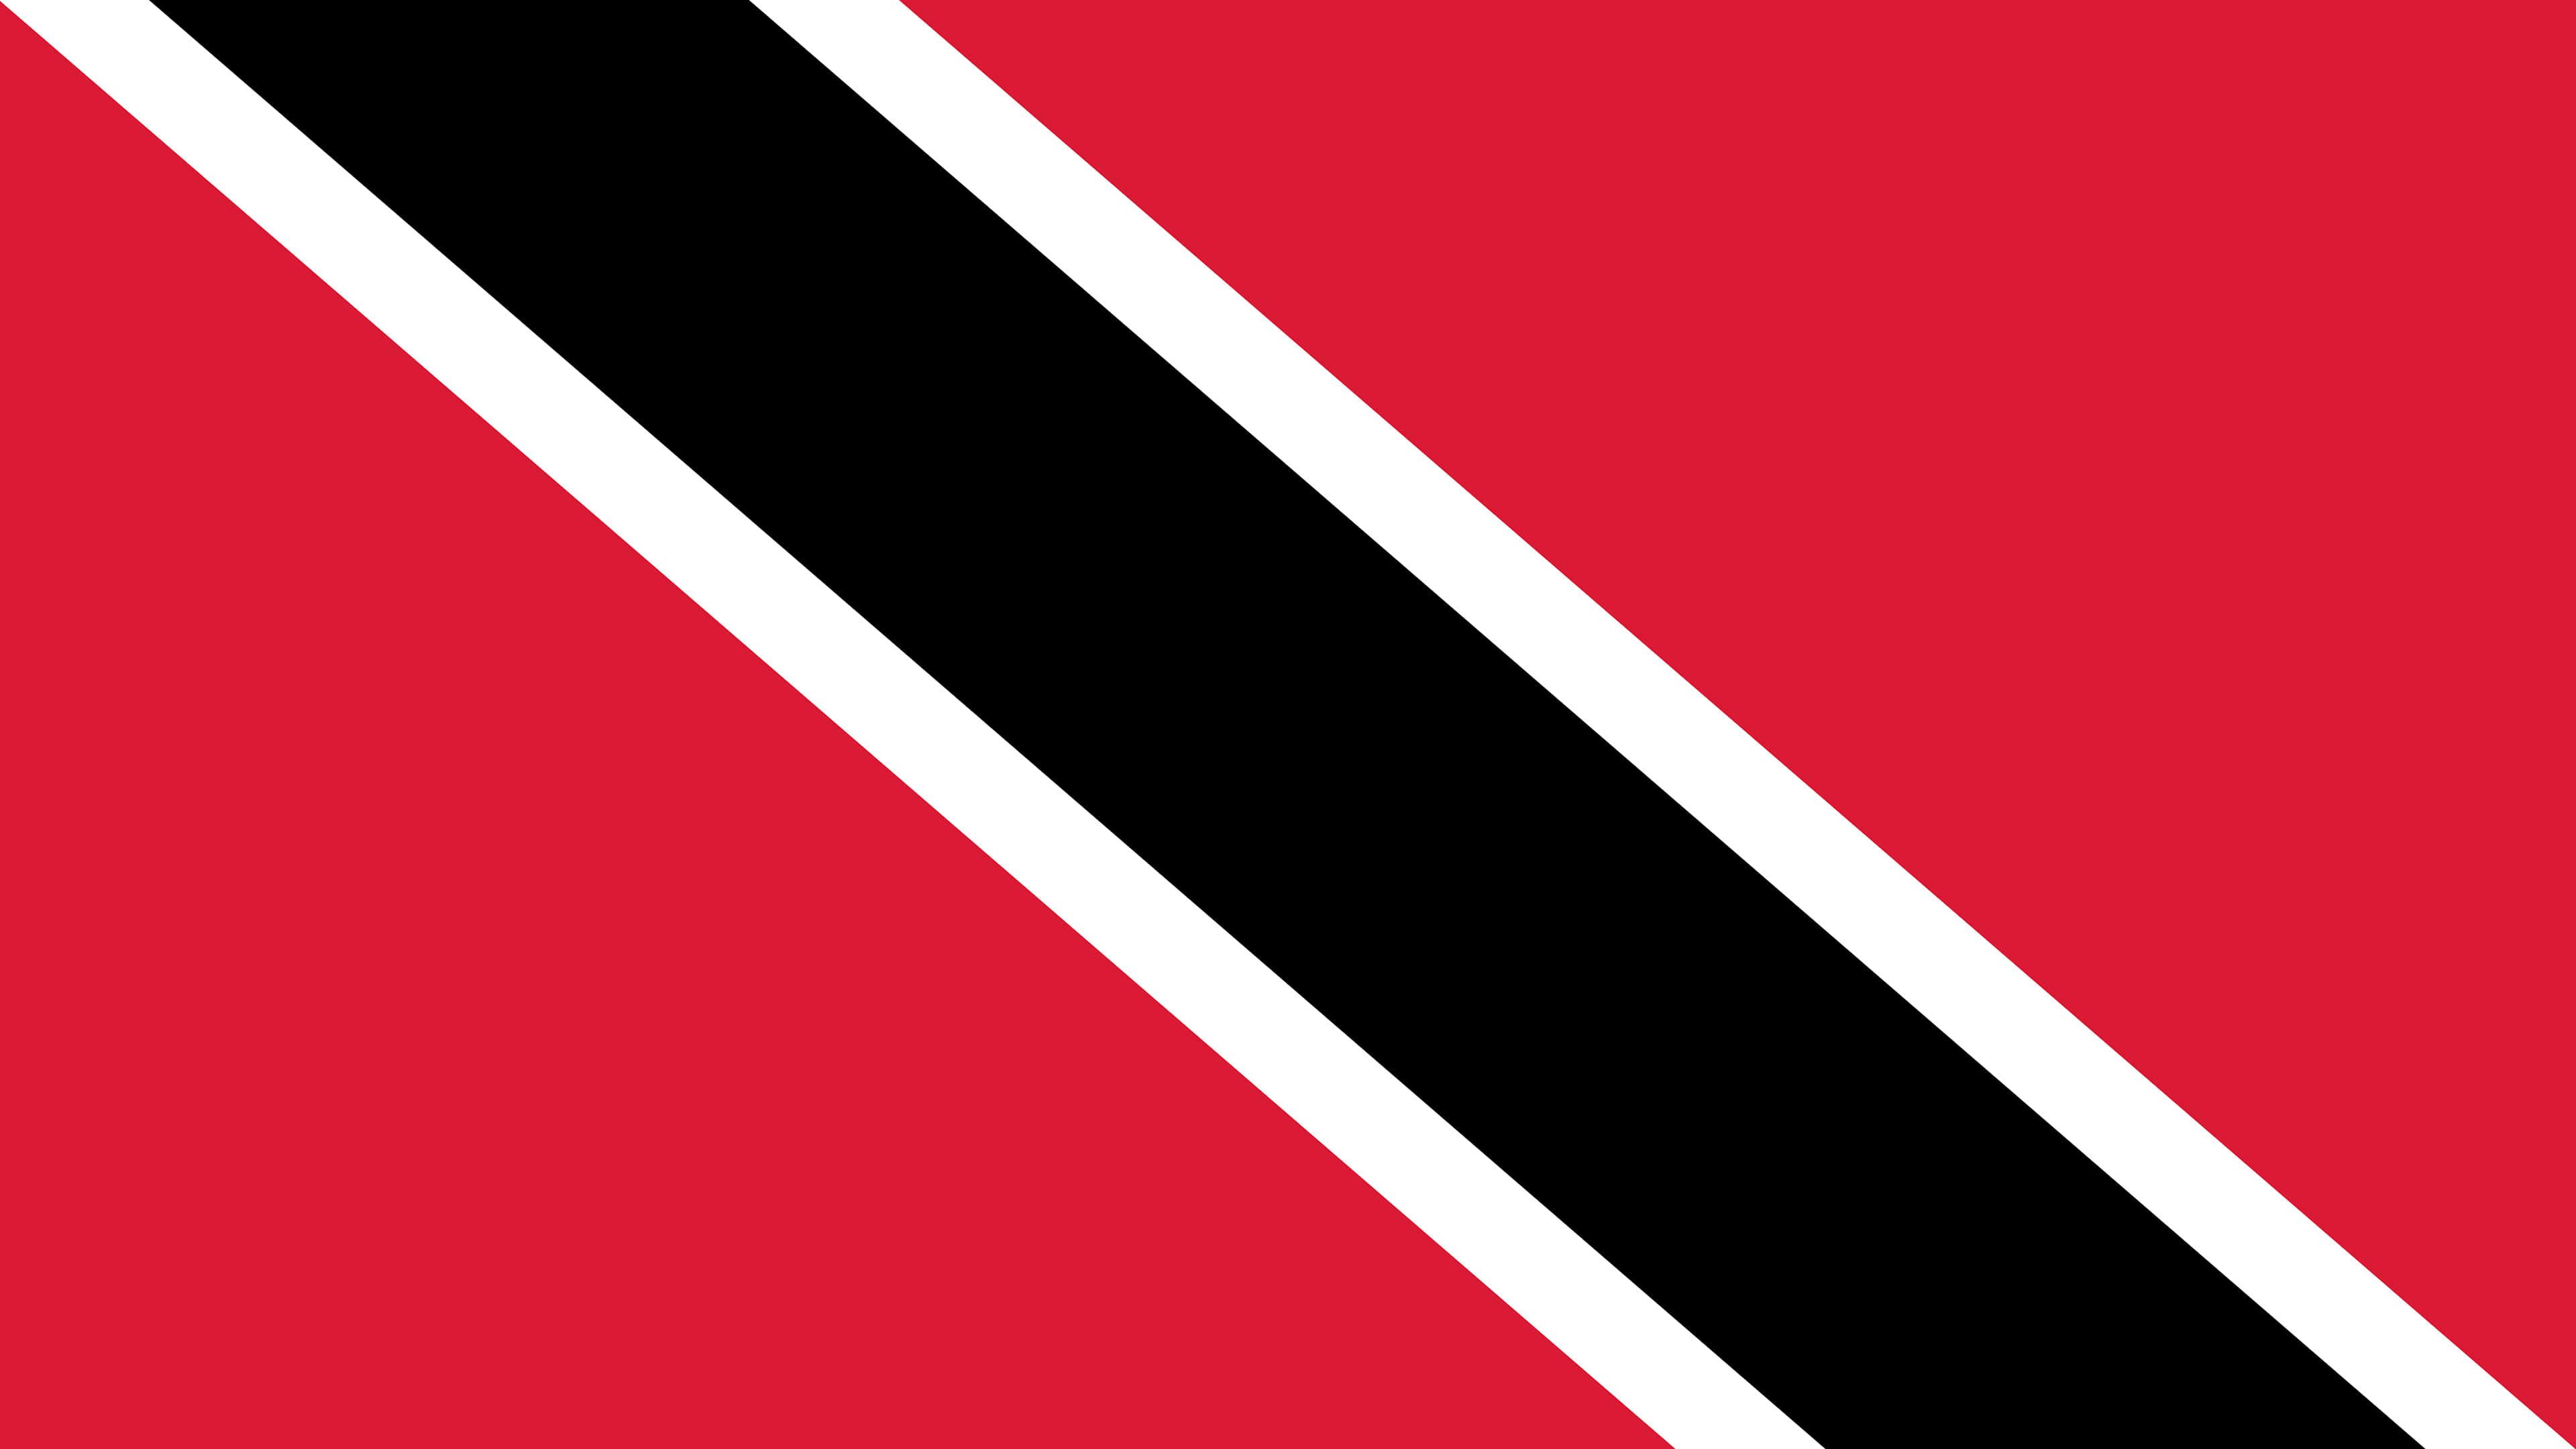 trinidad and tobago flag uhd 4k wallpaper